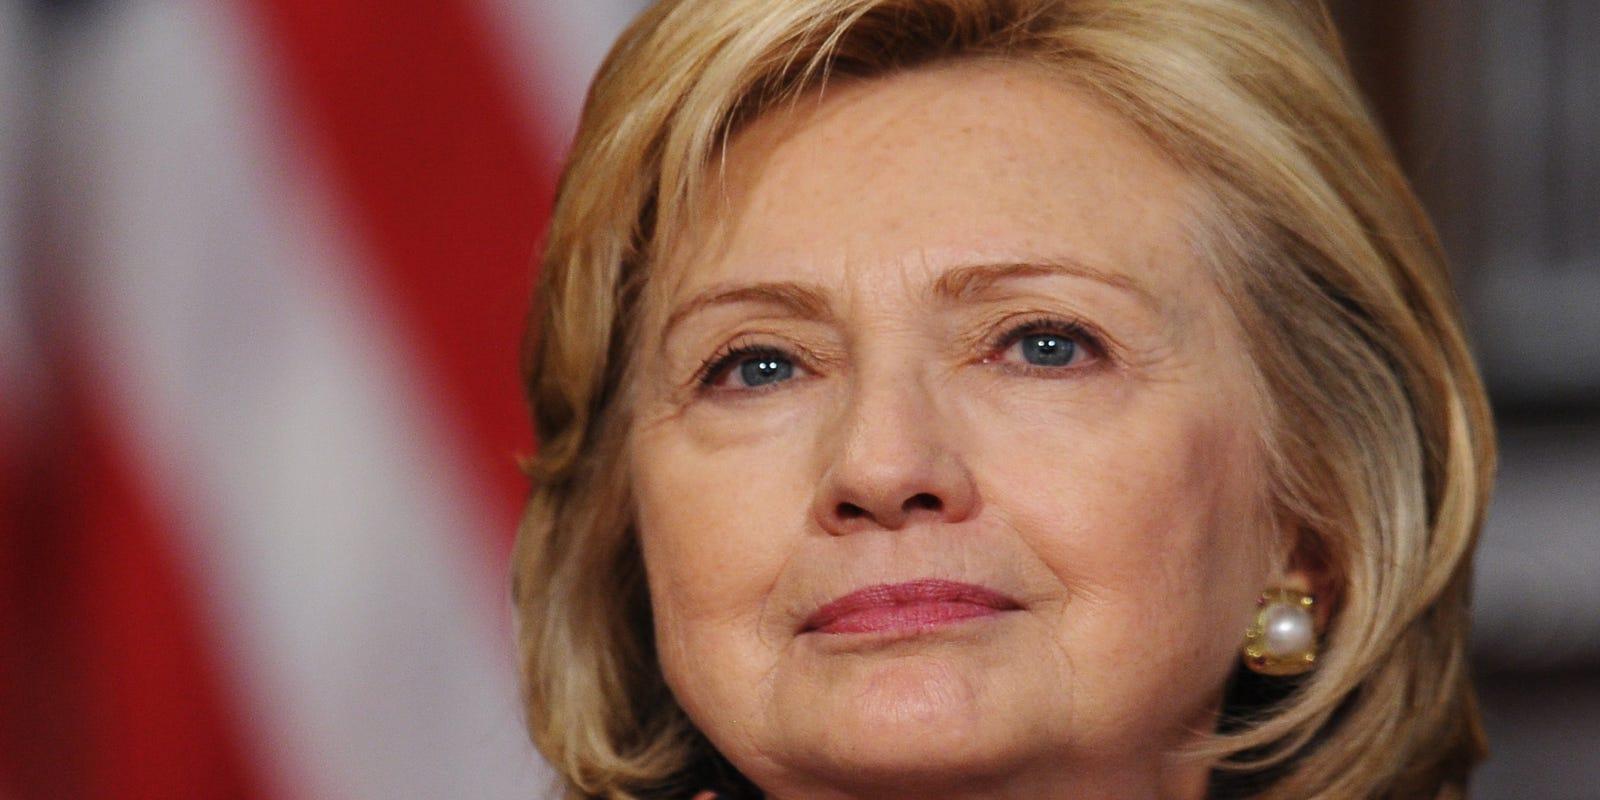 Fact check: Hillary Clinton, not Joe Biden, used the phrase 'super predators'